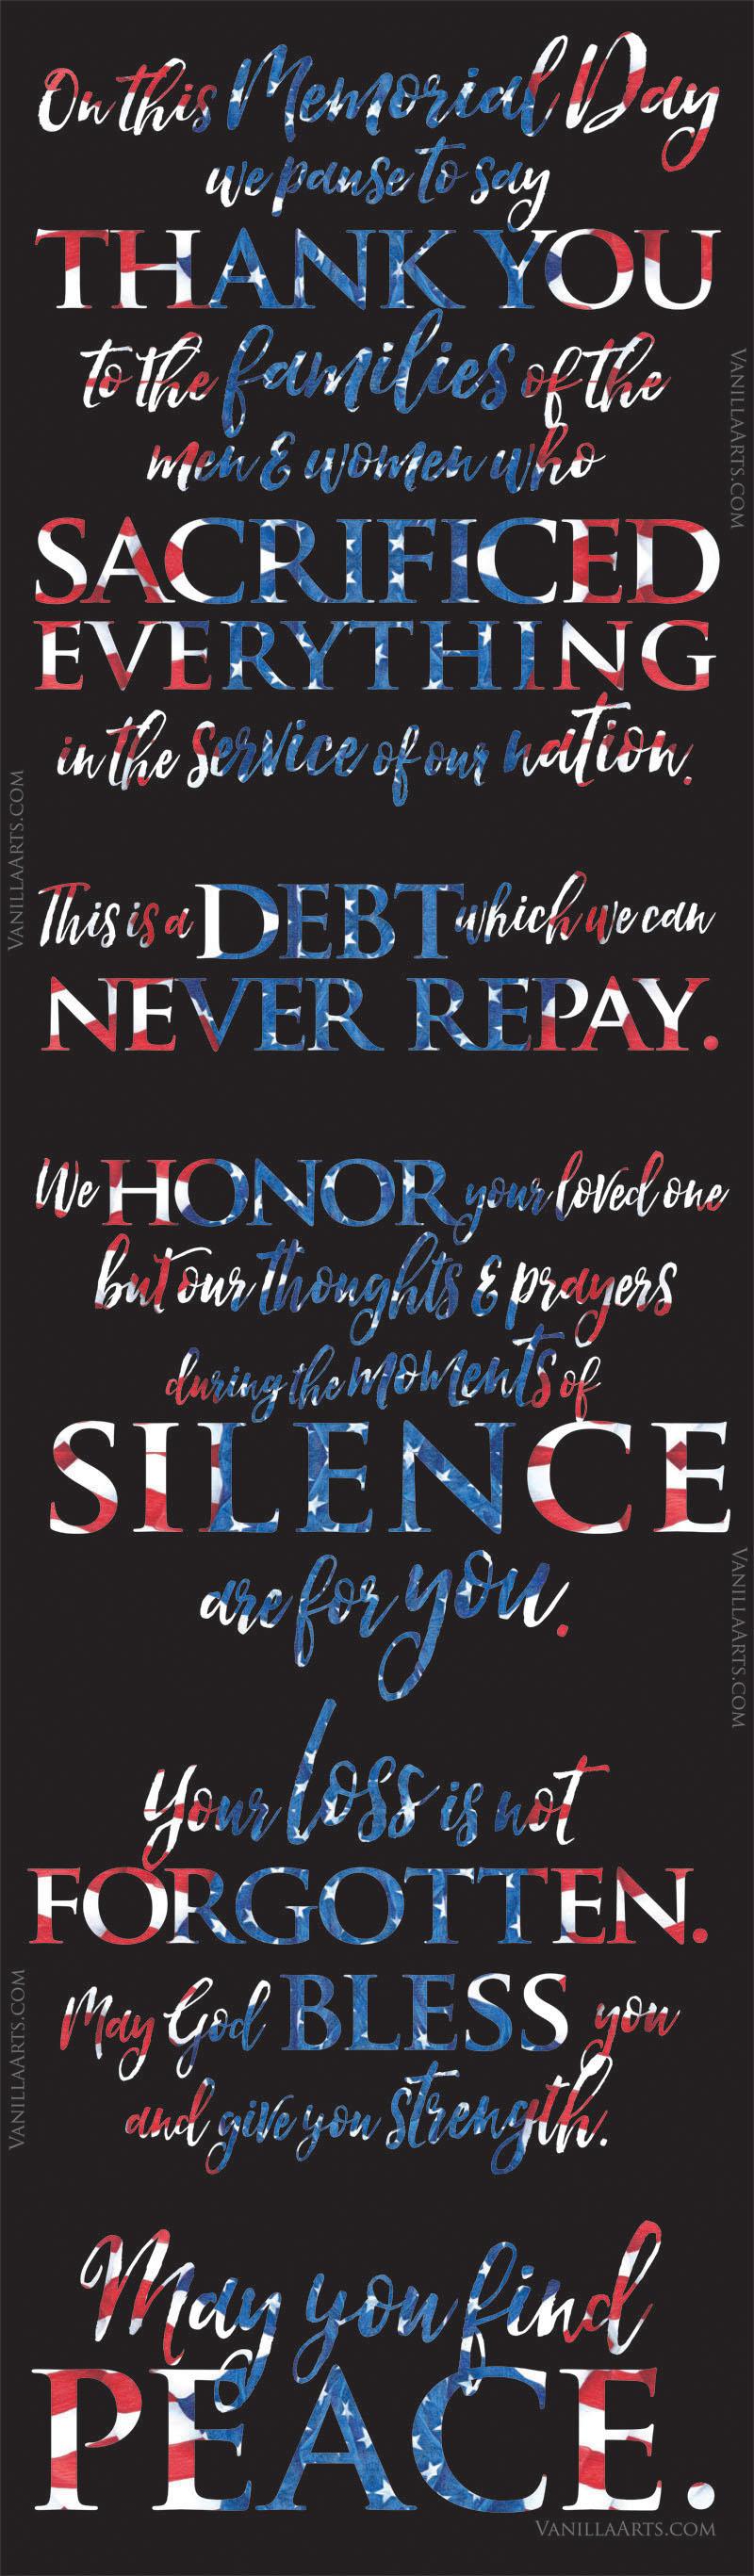 Remembering the families of fallen soldiers, marines, sailors, and airmen. | VanillaArts.com